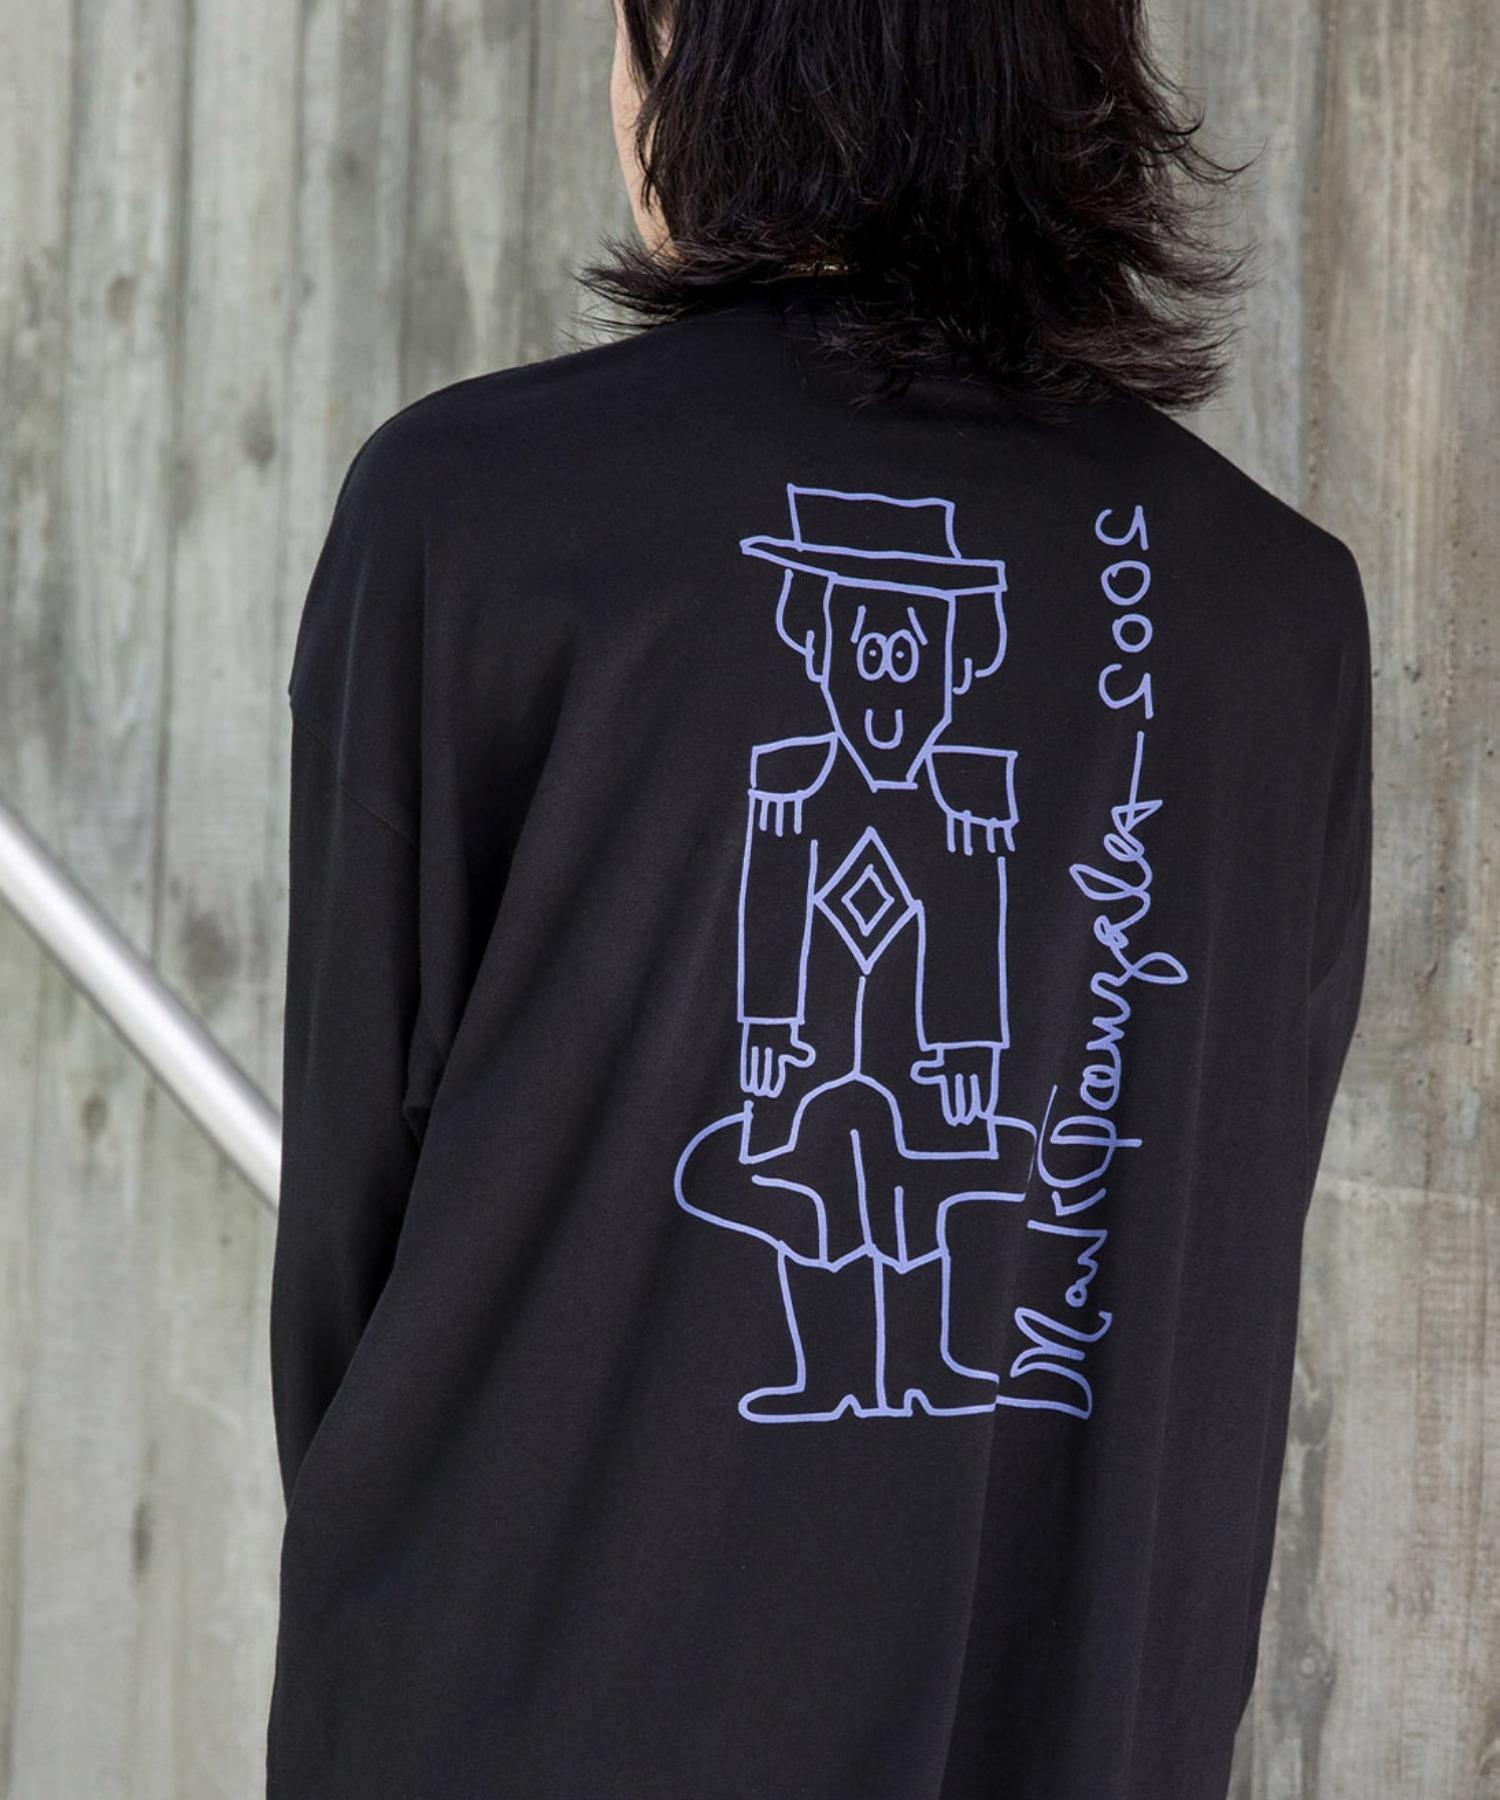 【BASQUE -enthusiastic design-】Mark Gonzales/マークゴンザレス BASQUE magenta別注 スーパービッグシルエット 長袖Tee(背面プリント)